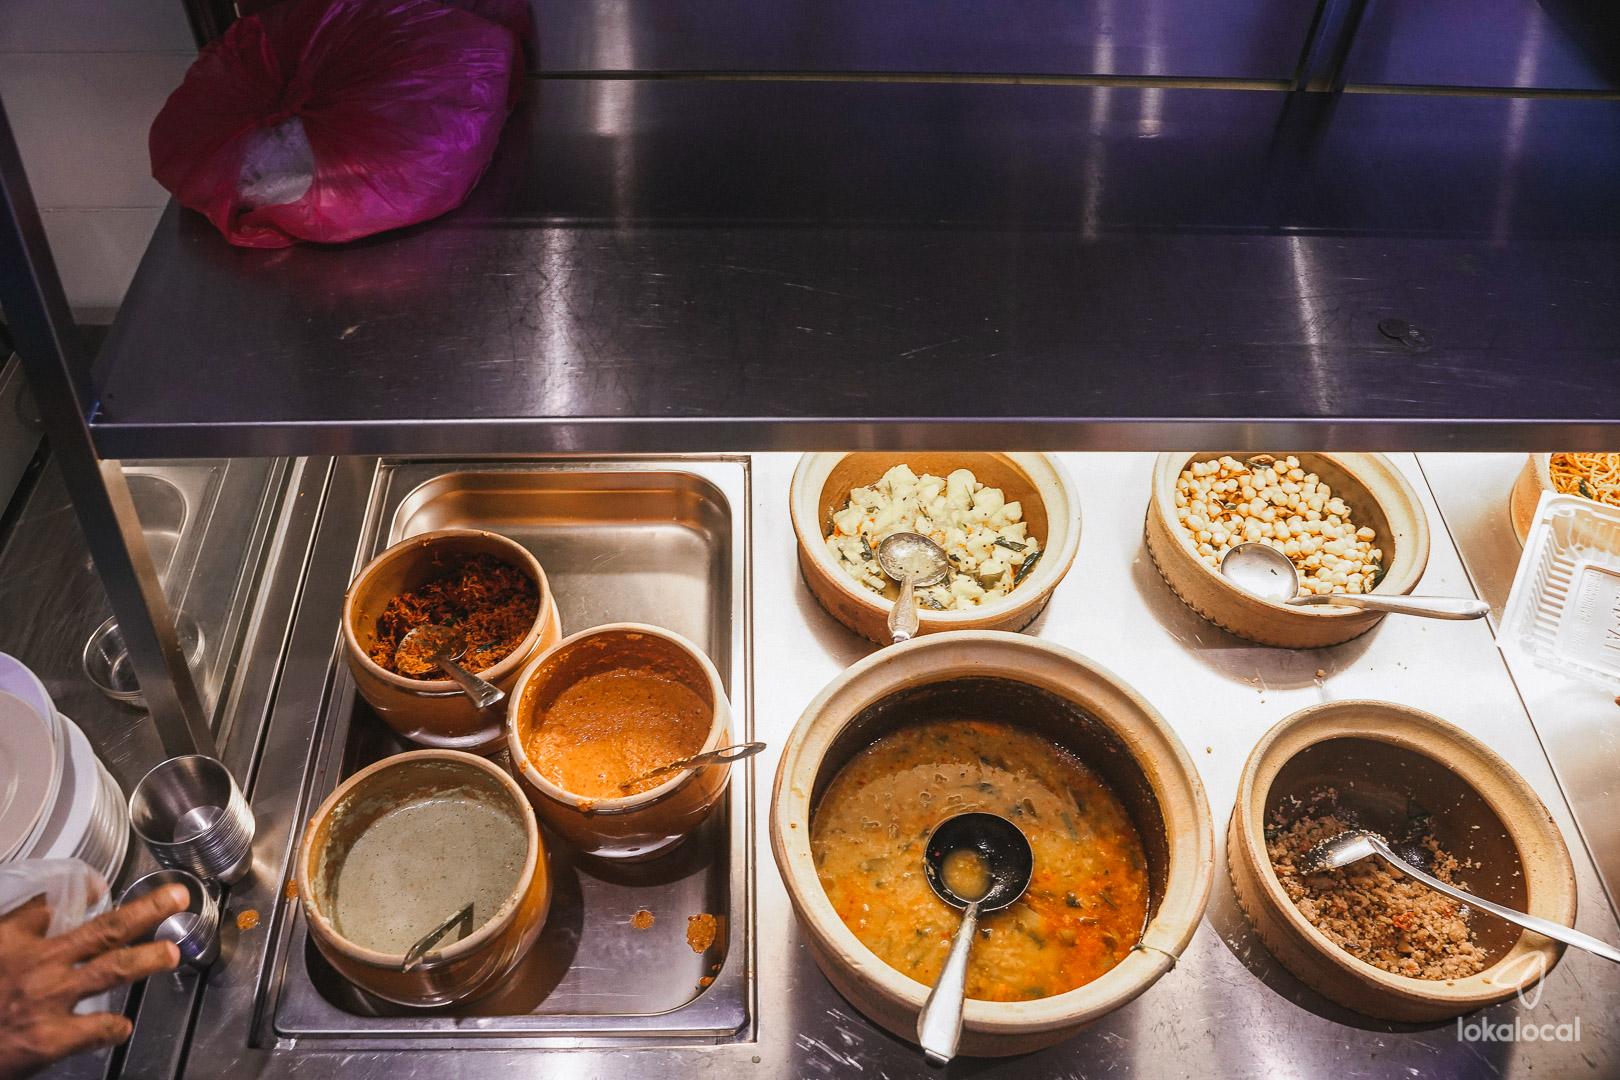 Brickfields: 15 Must Eat Food in Kuala Lumpur's Little India - www.lokalocal.com